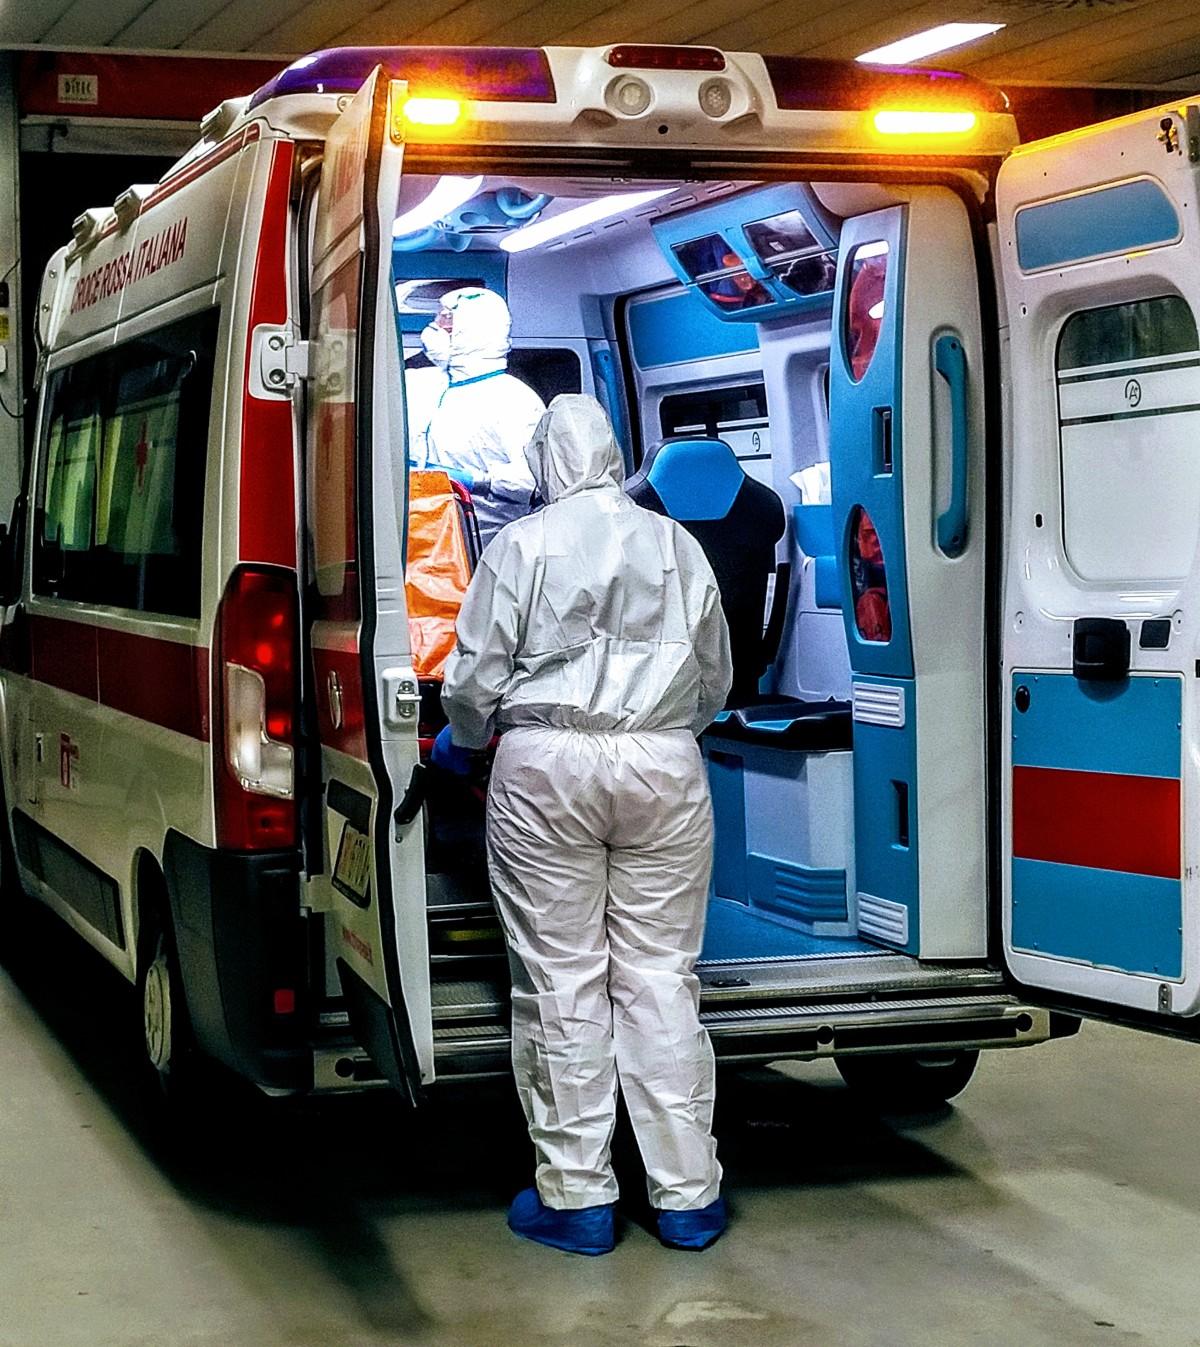 Medicina ad Alta Intensità: nasce a Varese un reparto dedicato per i positivi alCovid-19